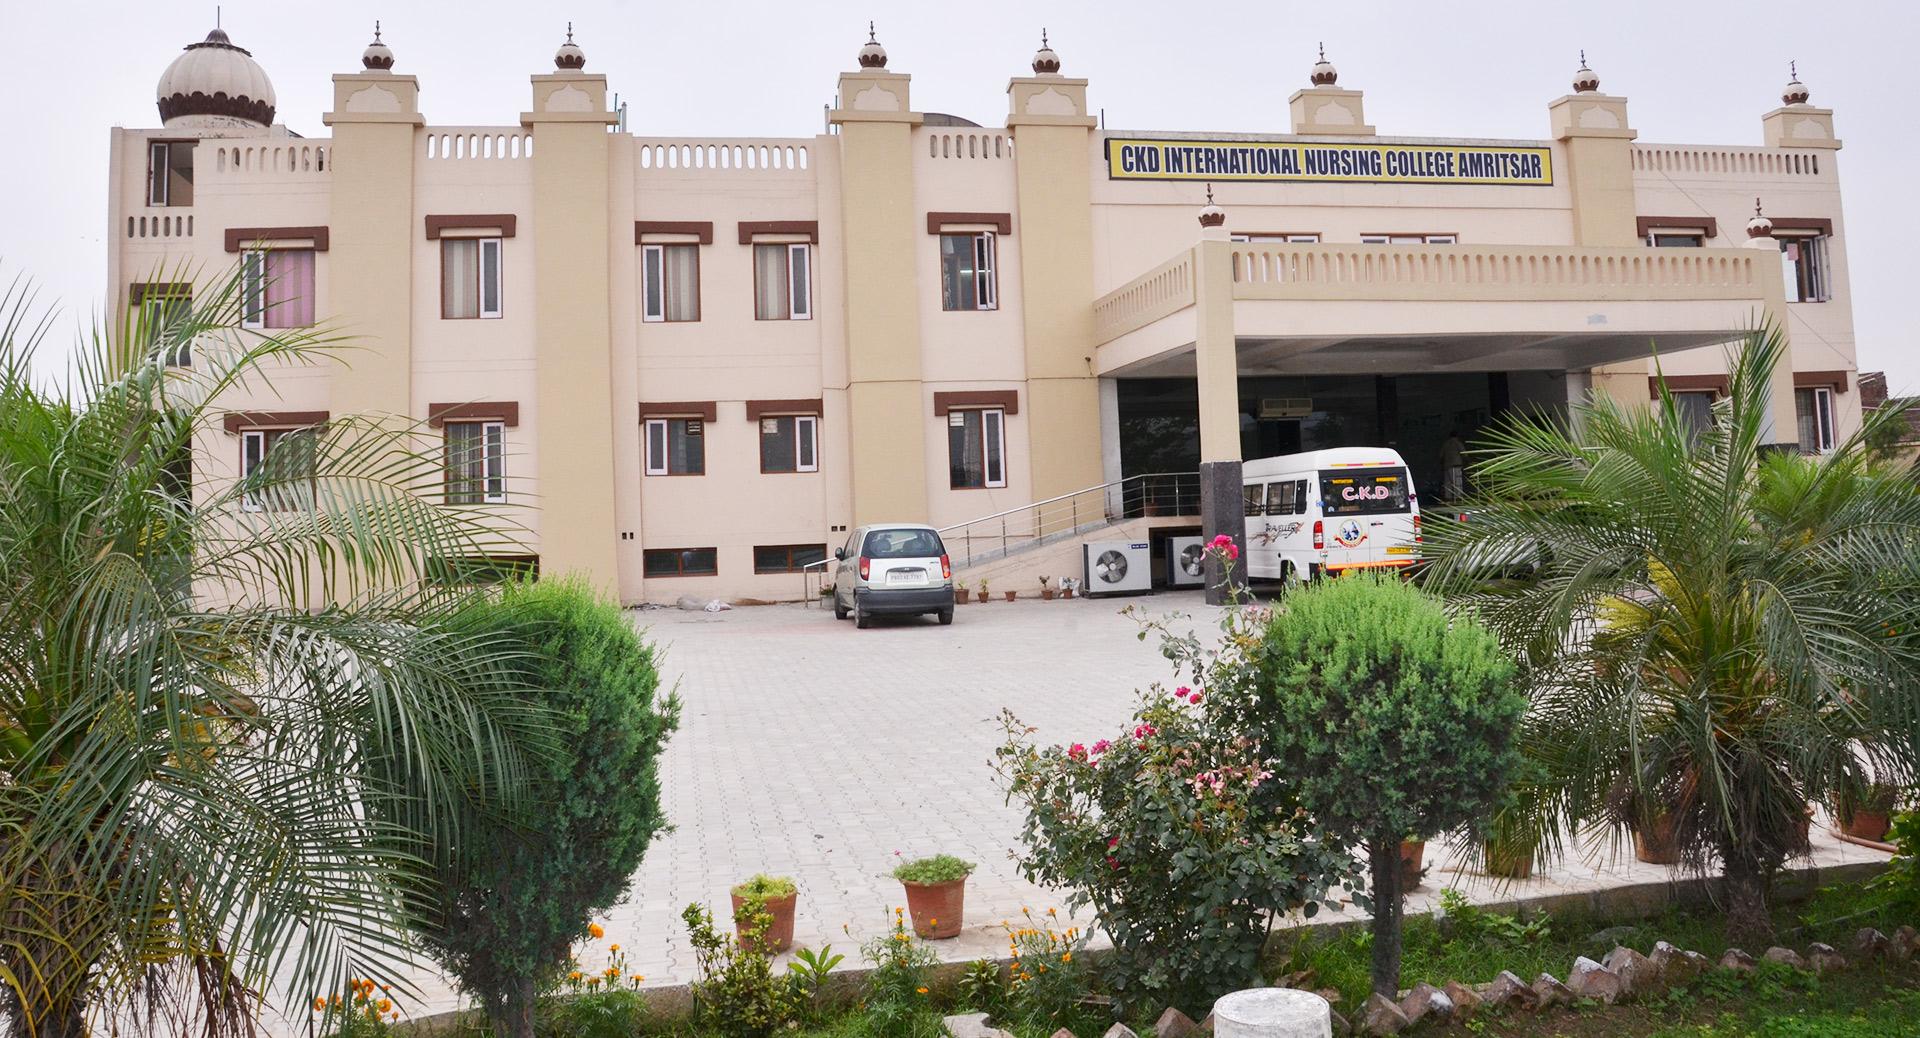 Chief Khalsa Diwan International Nursing College, Amritsar Image